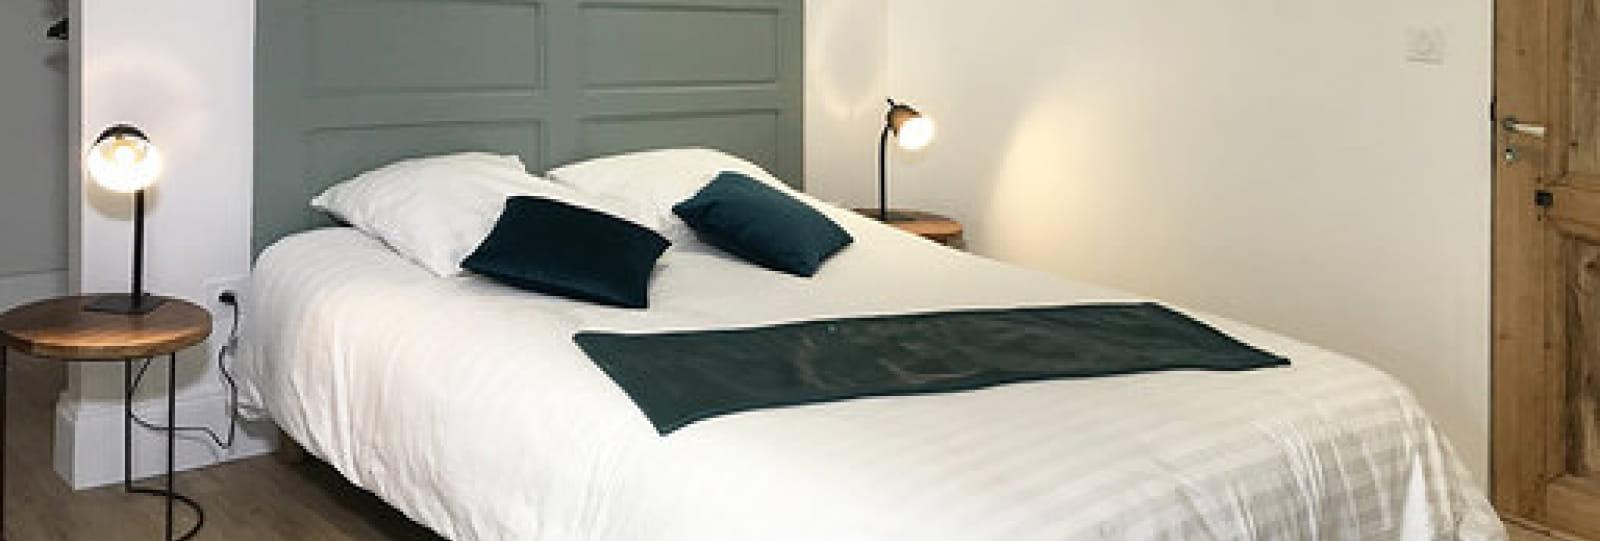 chambre ô Joly Valois